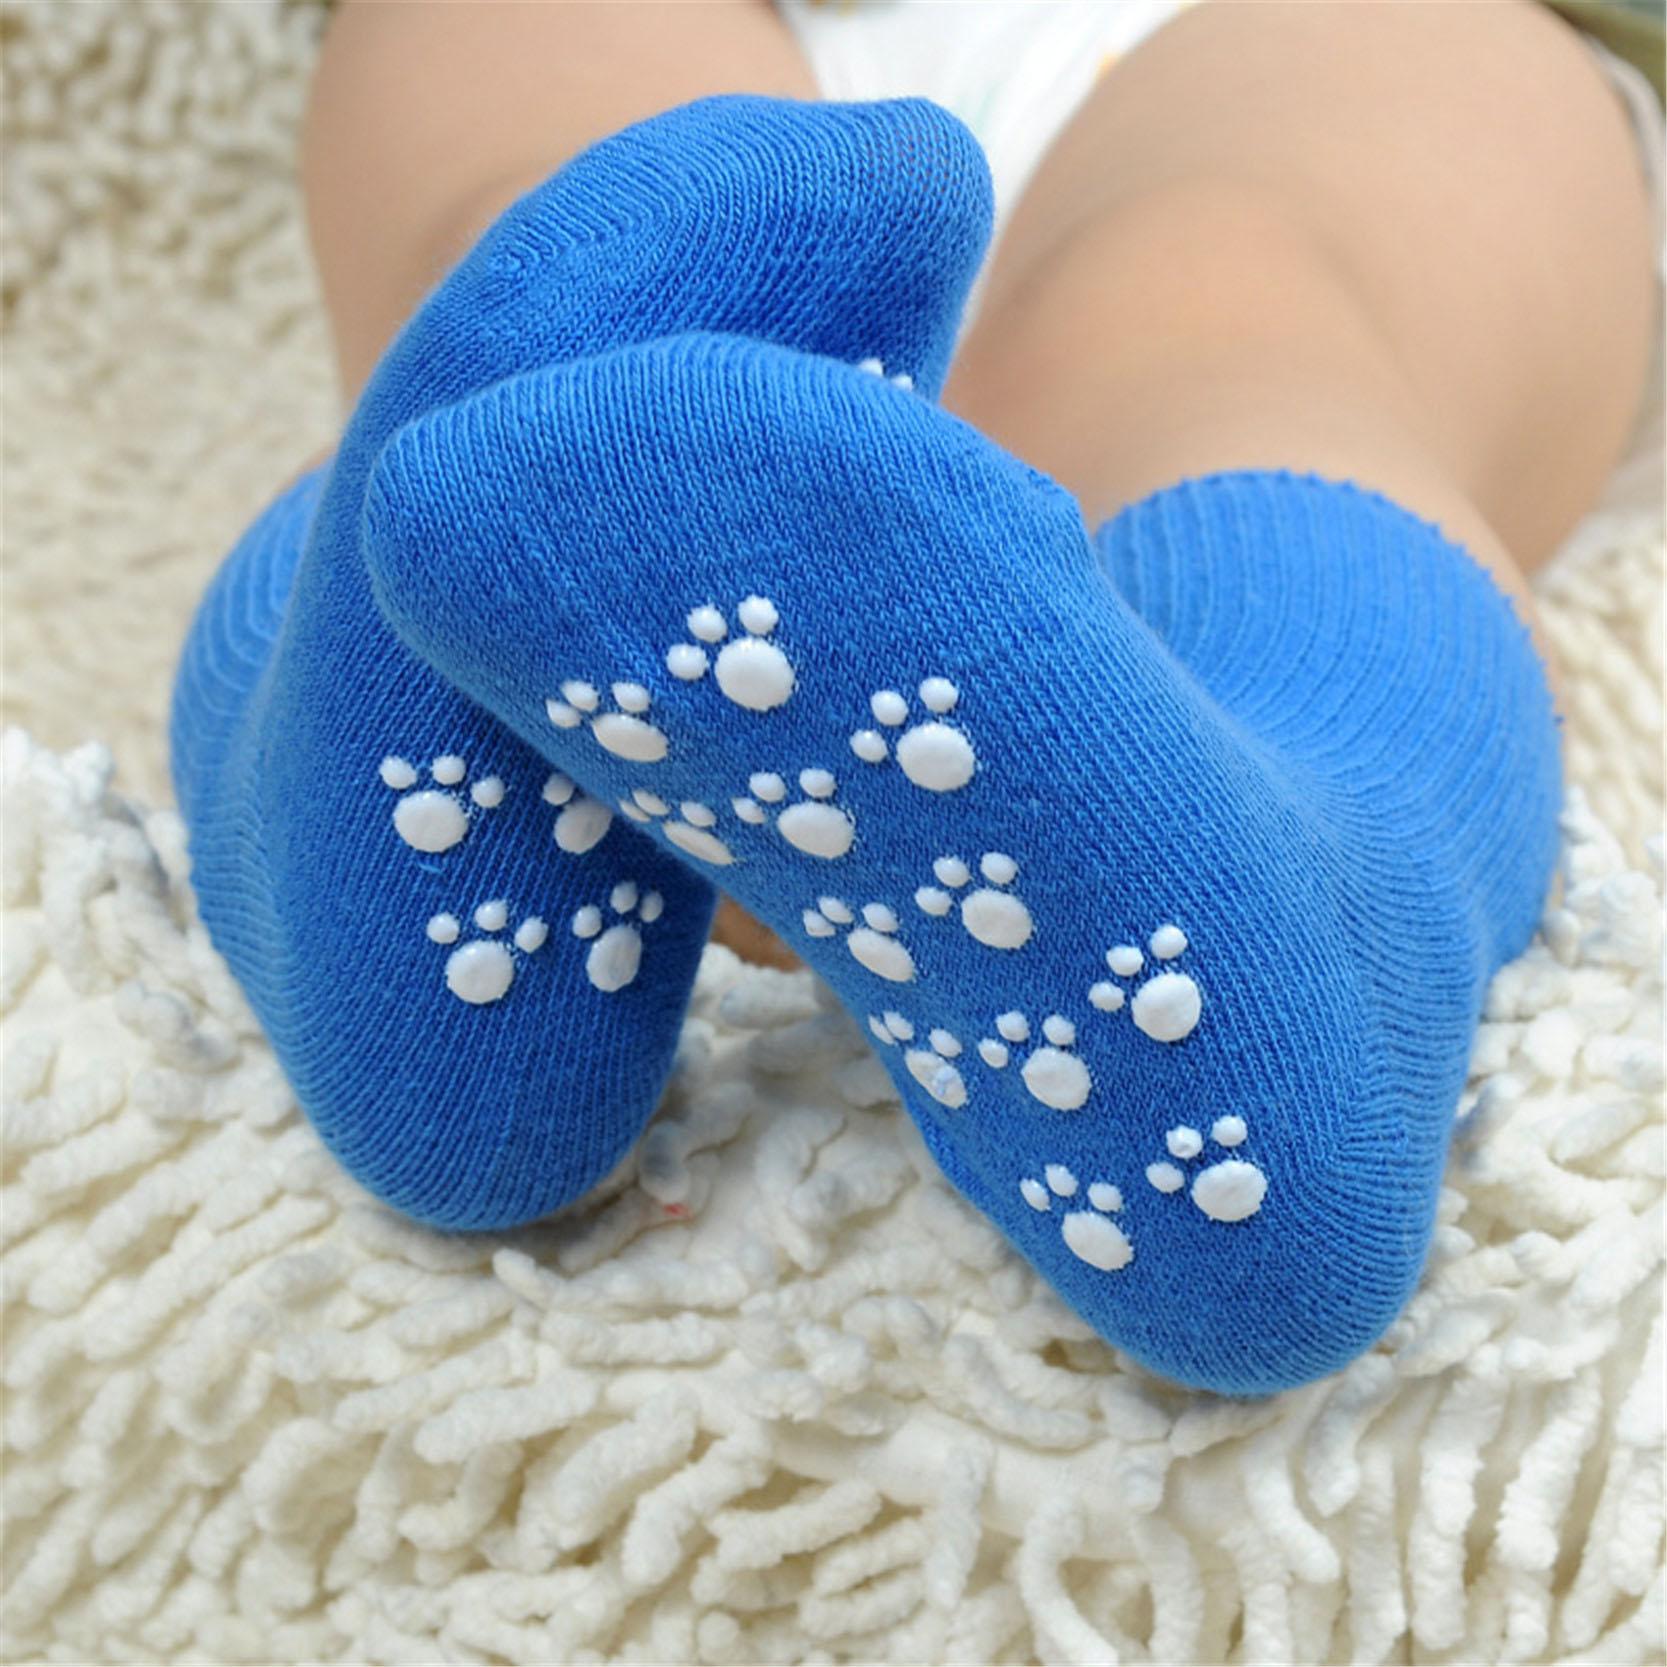 New Born Baby Stocks Cotton Anti Slip Stoking yang Nyaman Untuk Gadis Boys Unisex Toddler 1-3 Tahun Kanak-kanak Socks Candy Warna Pepejal